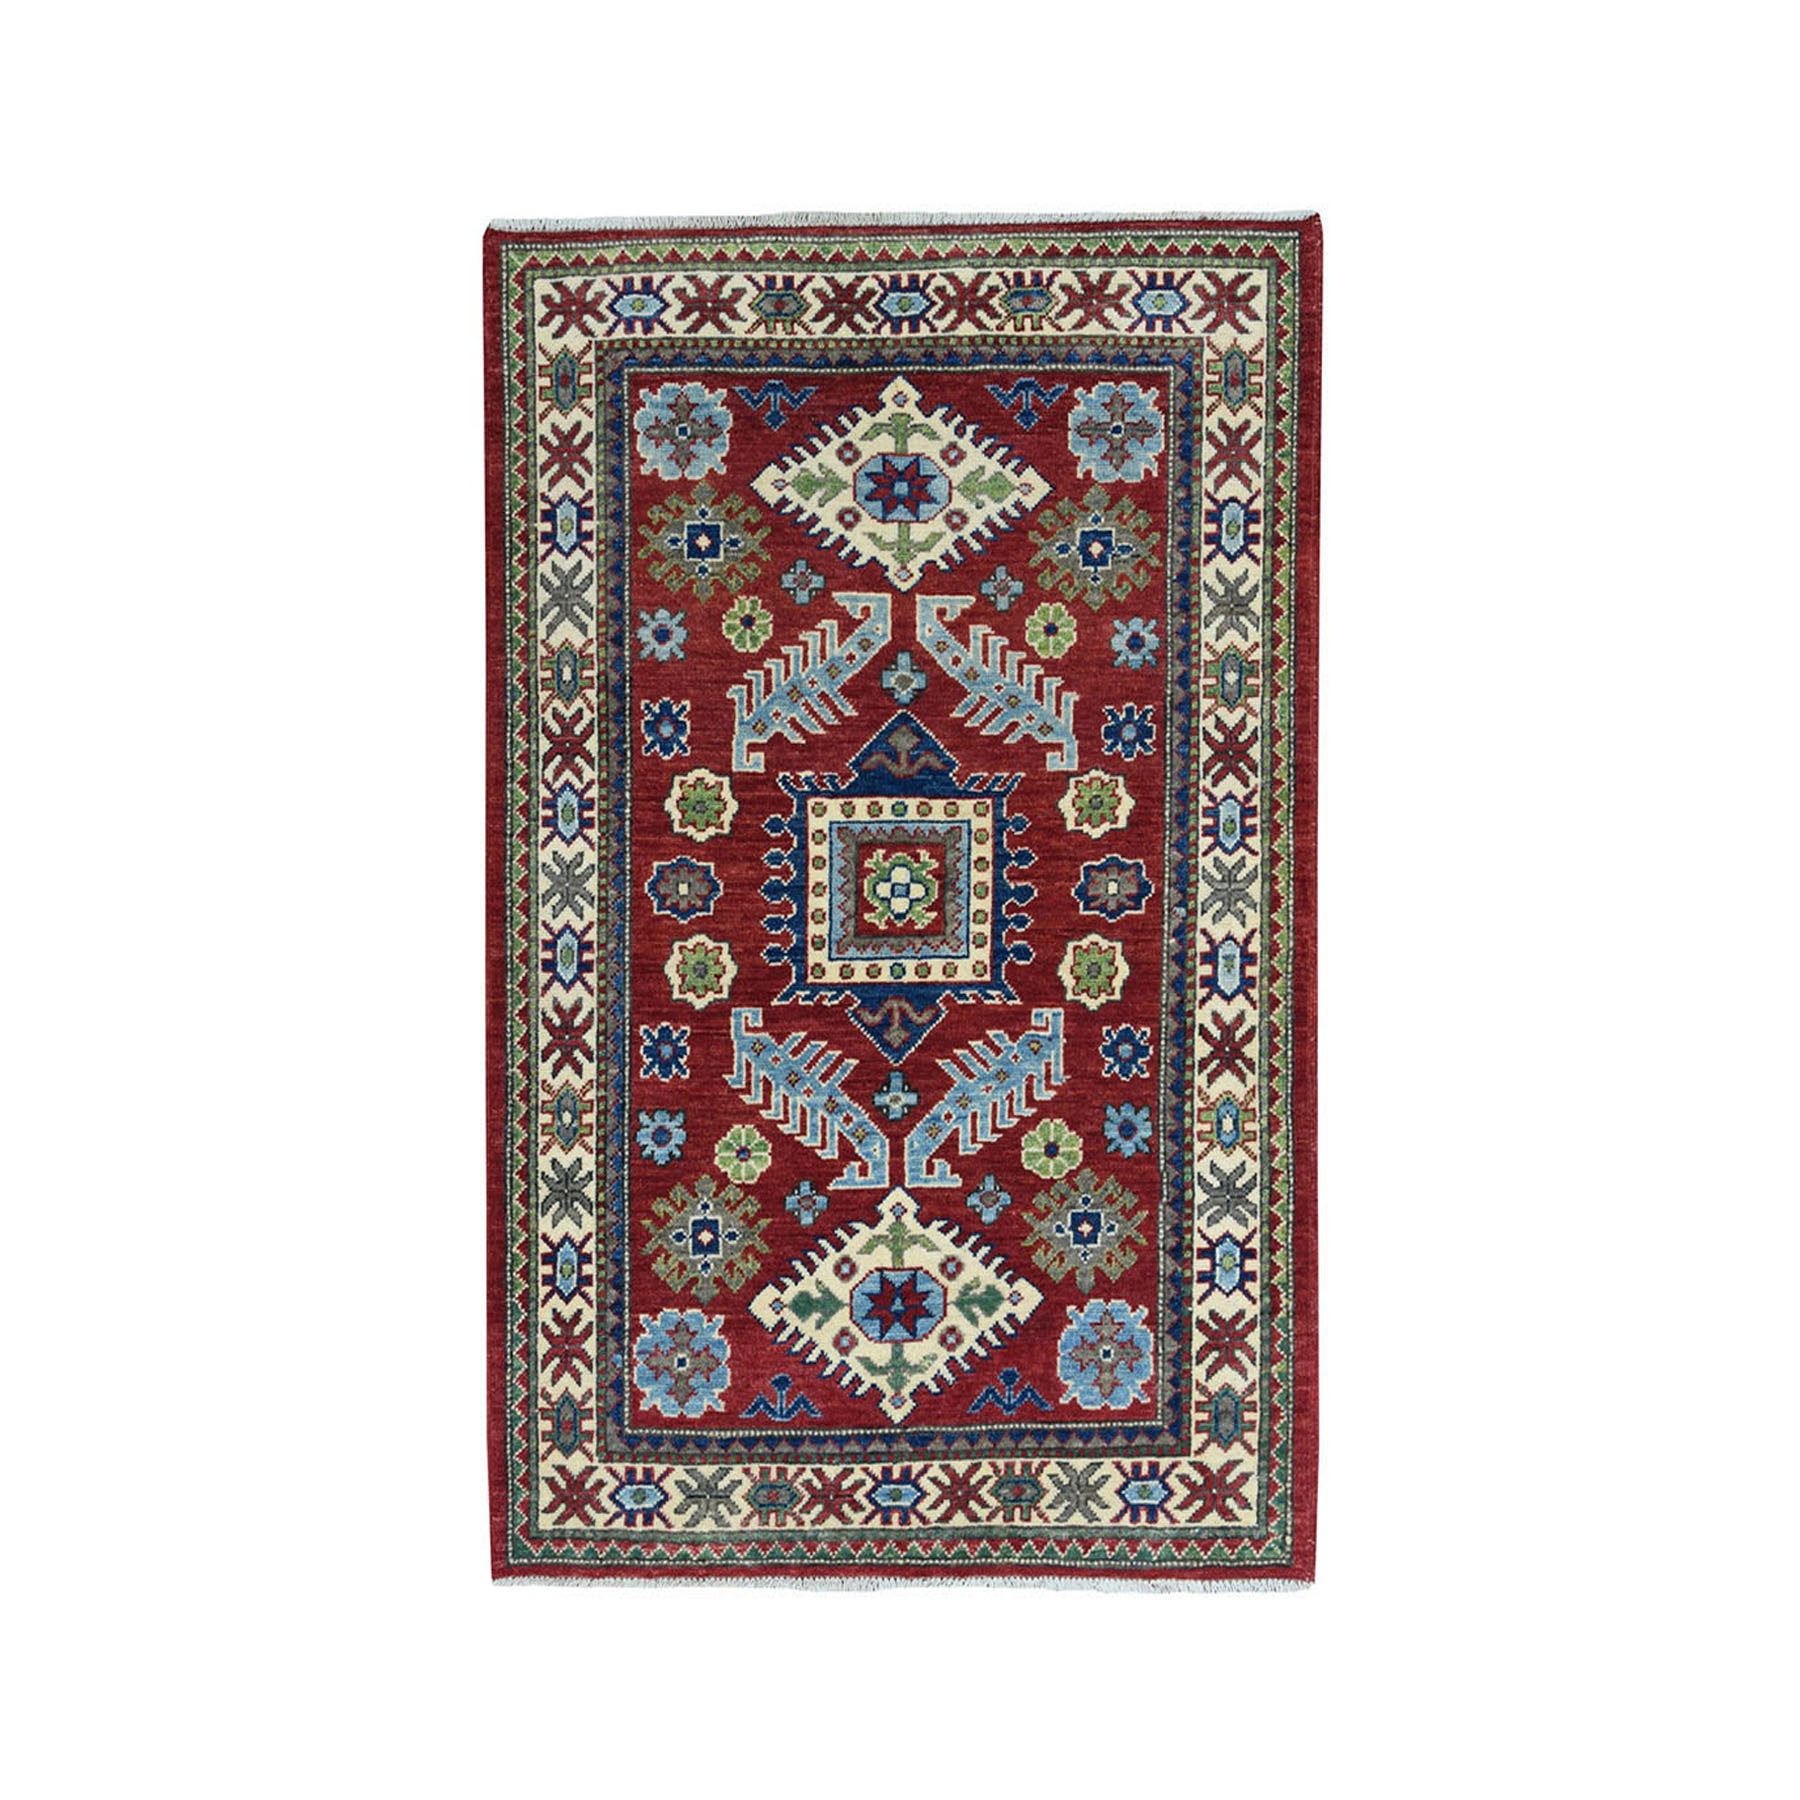 "3'2""X4'9"" Red Geometric Design Kazak Pure Wool Hand-Knotted Oriental Rug moae08db"